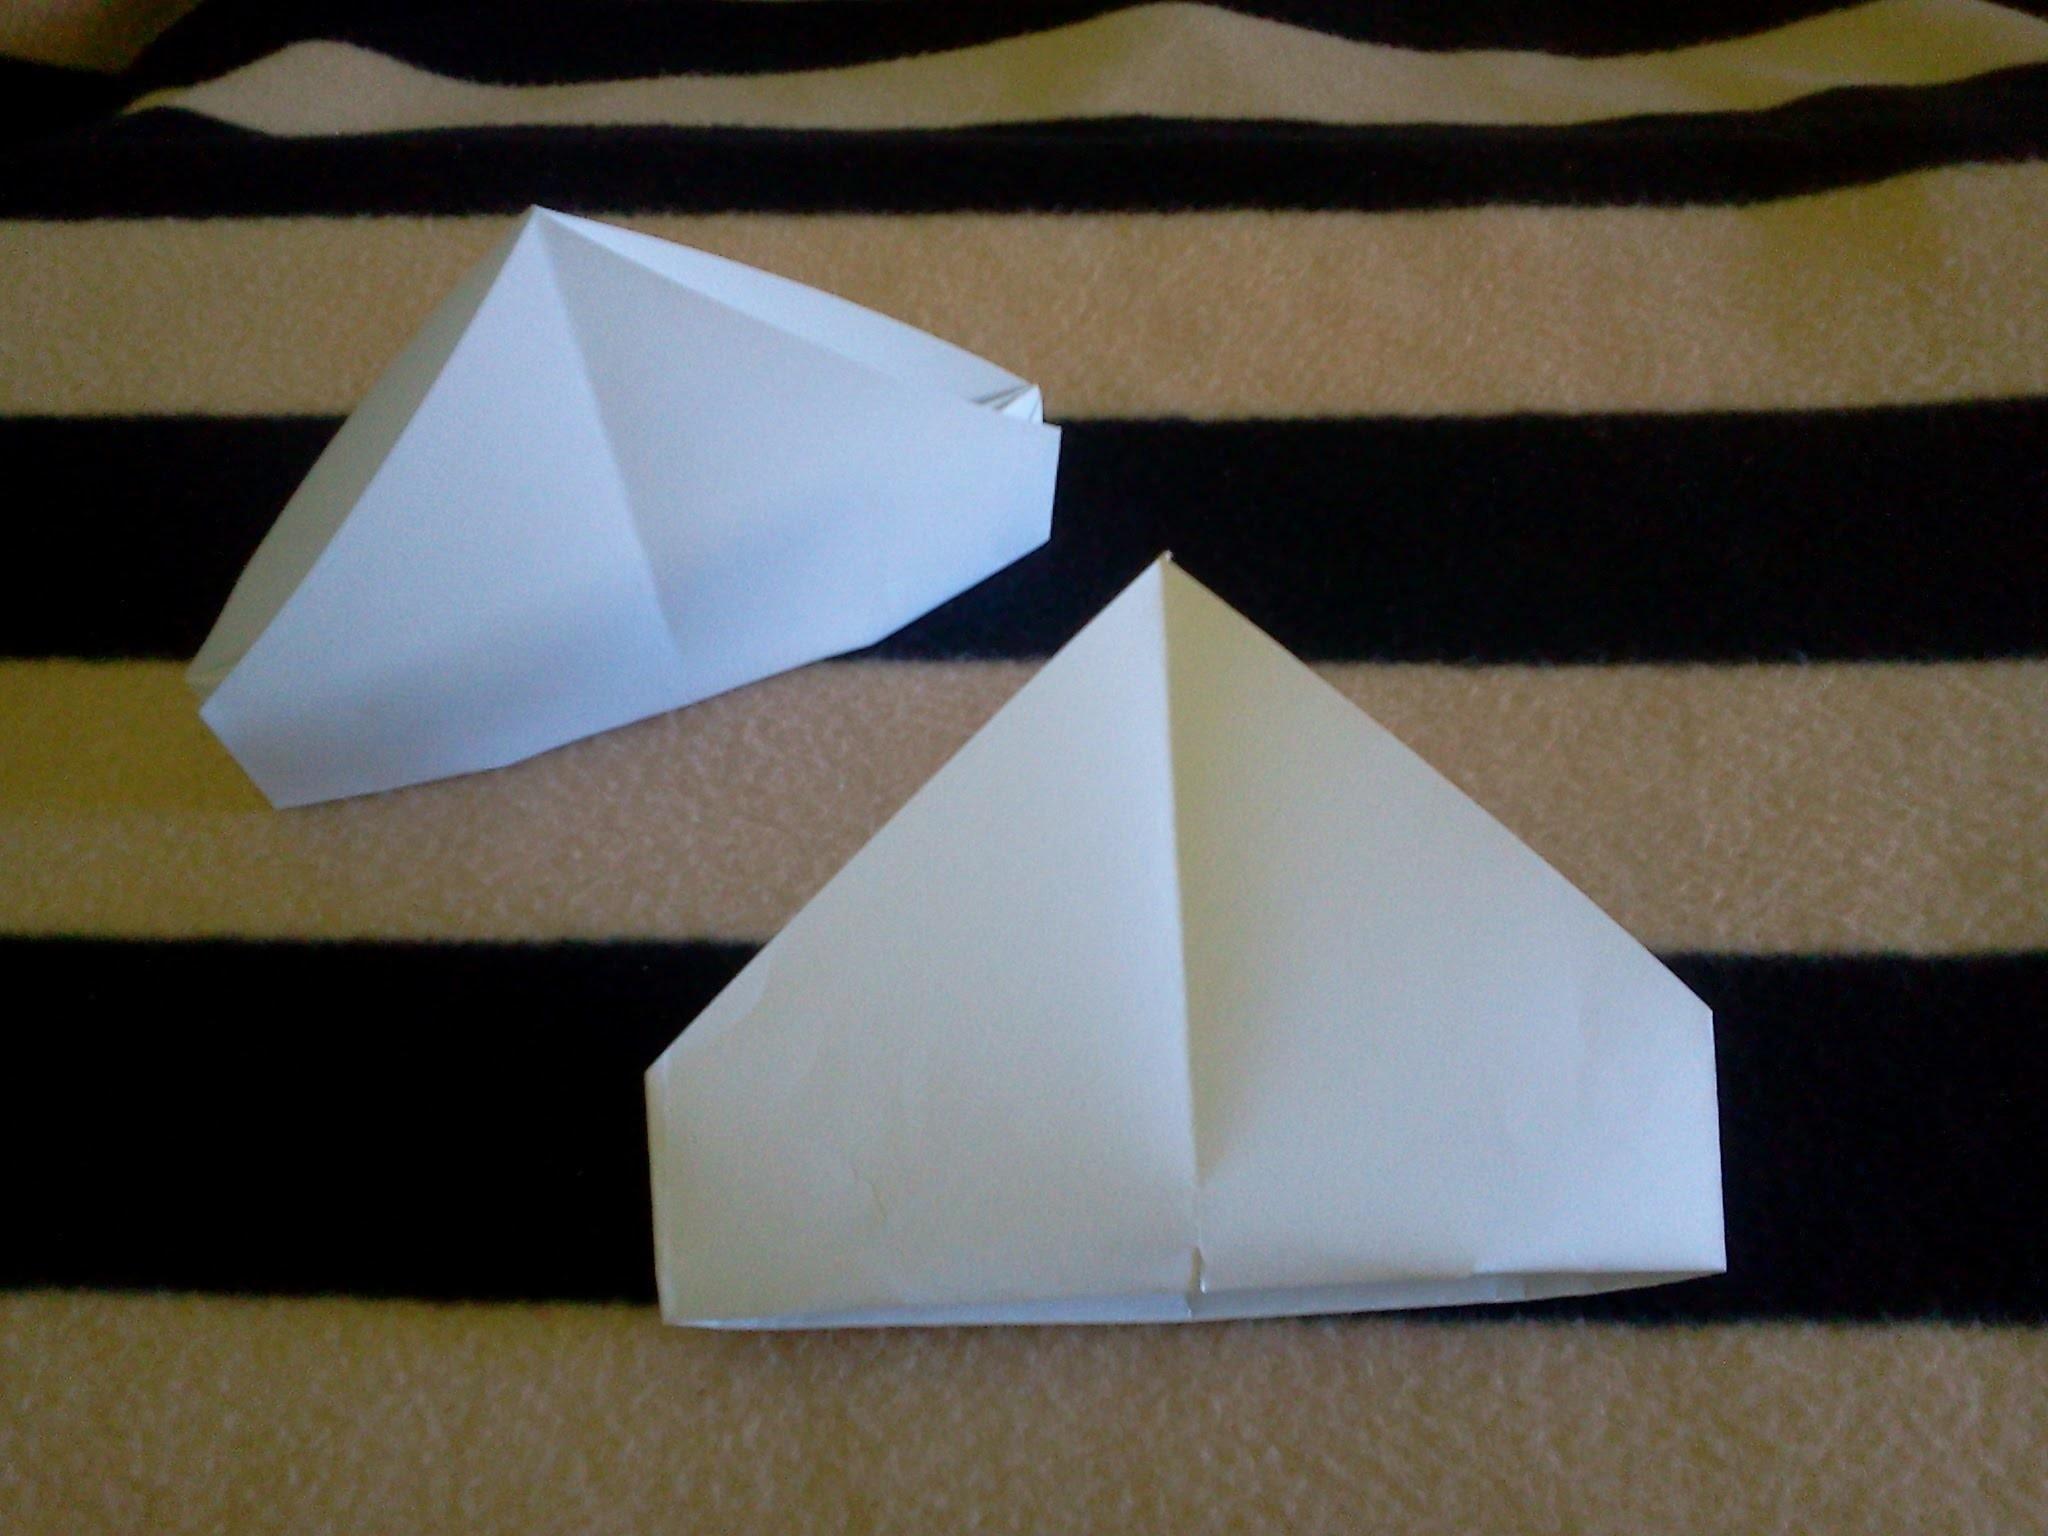 Origami bishop's mitre - Mitra de Obispo de papel